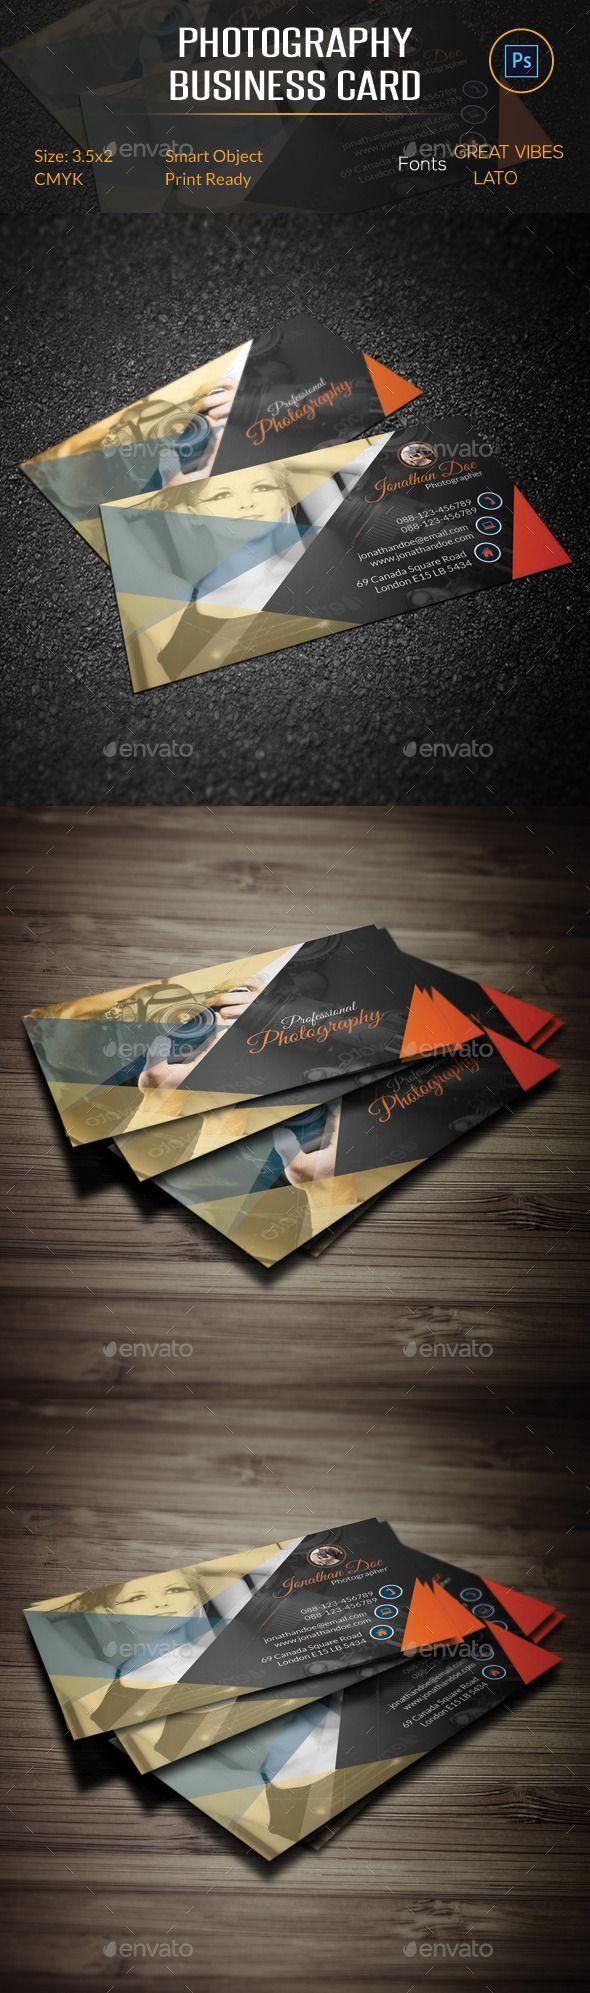 40 best Business Card images on Pinterest | Business card design ...